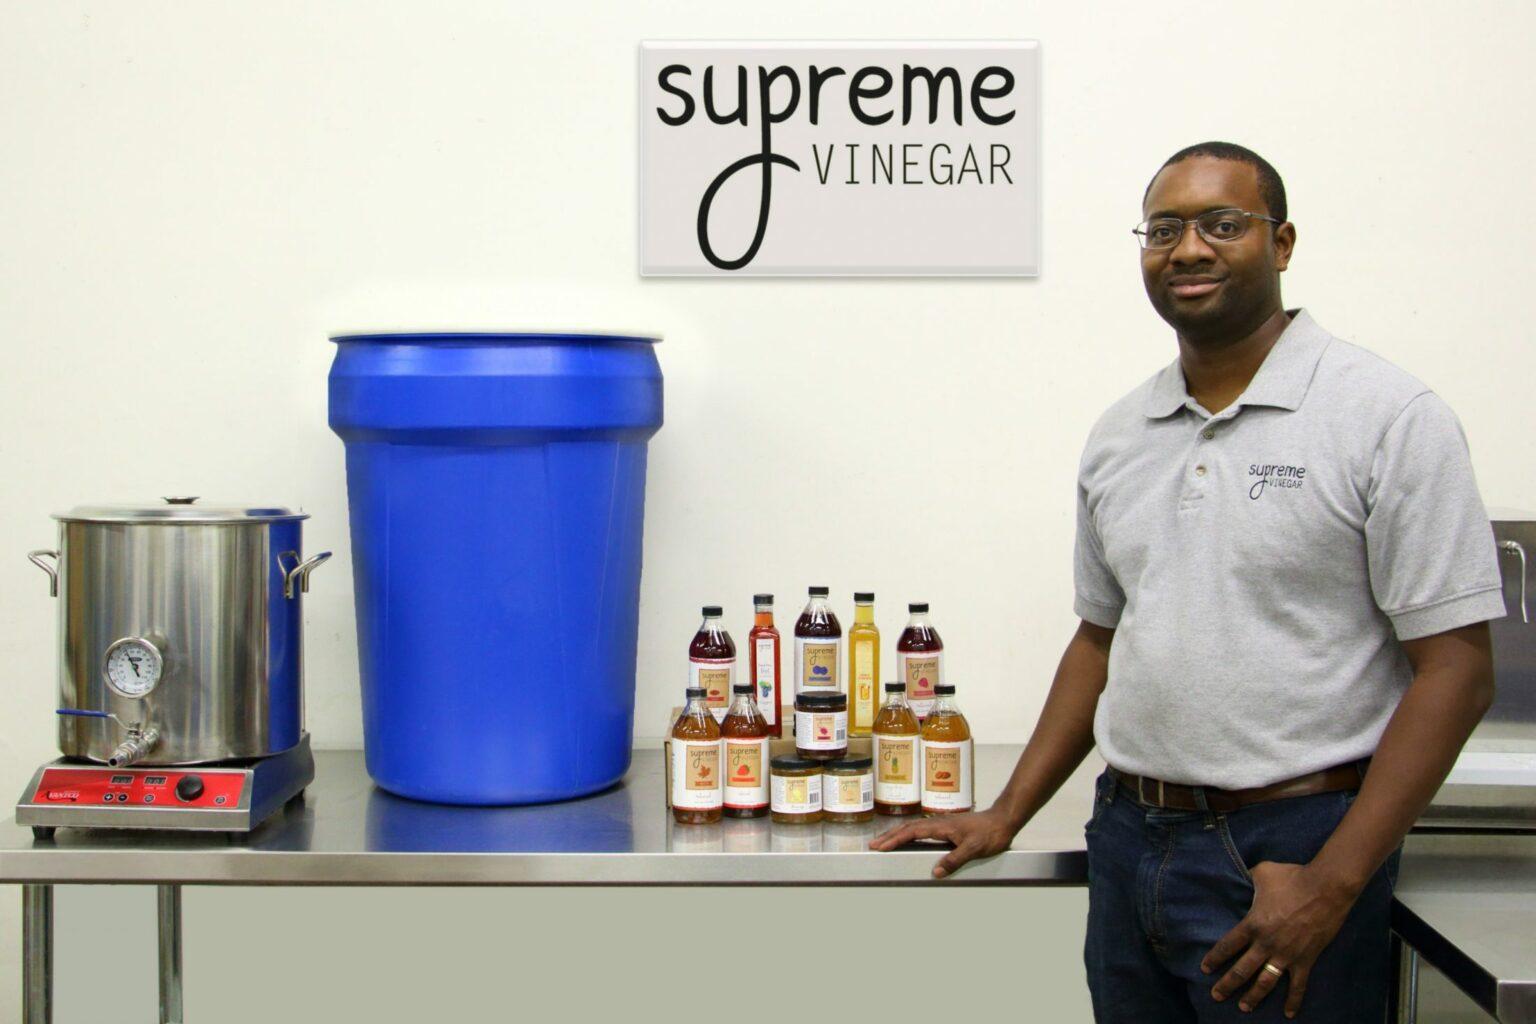 Supreme Vinegar's Spotlight on the Eternal Condiment